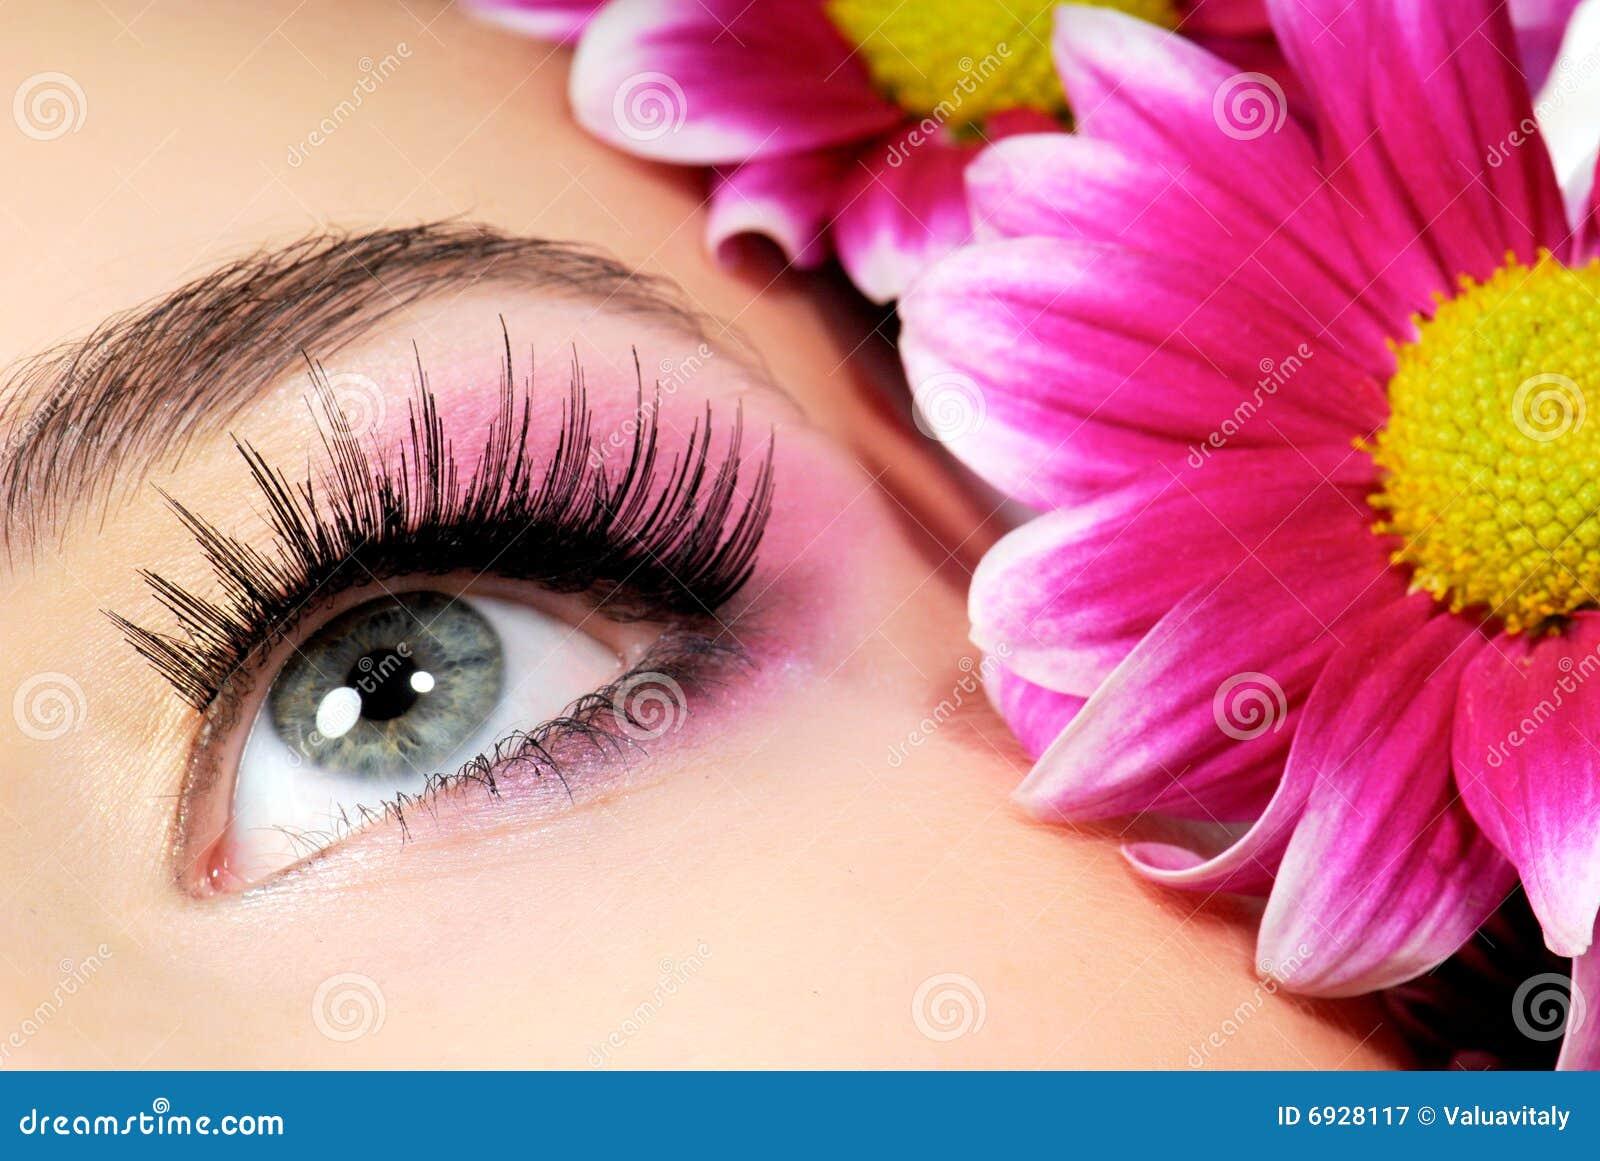 Beauty Pink Make Up Stock Image Image Of Macro Flower 6928117